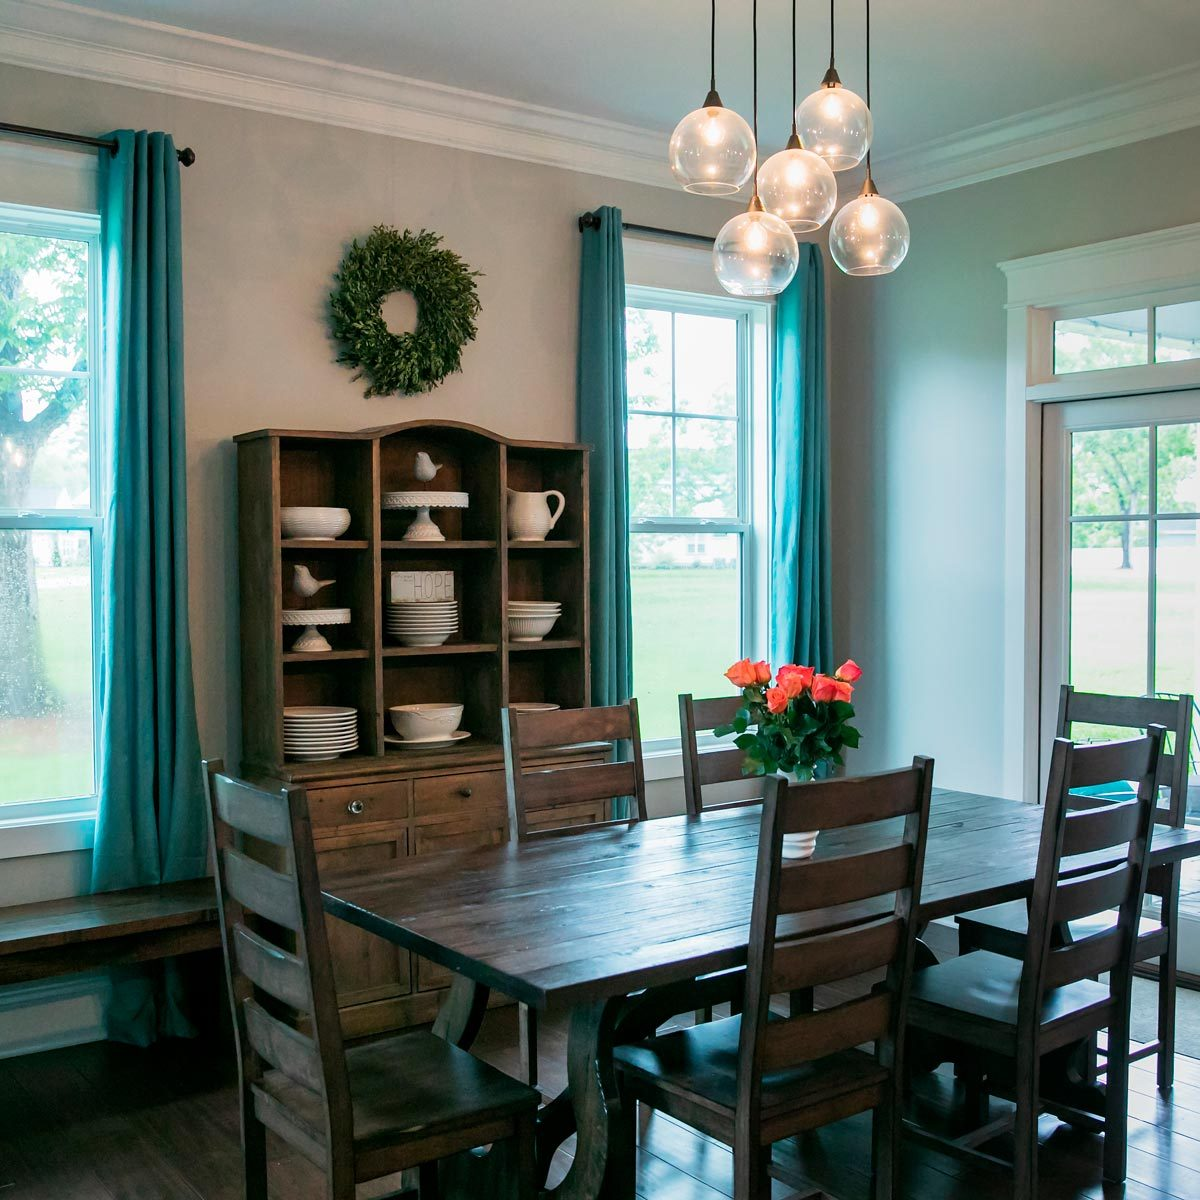 The Best Simple Dining Room Ideas: Stylish Dining Room Curtain Ideas